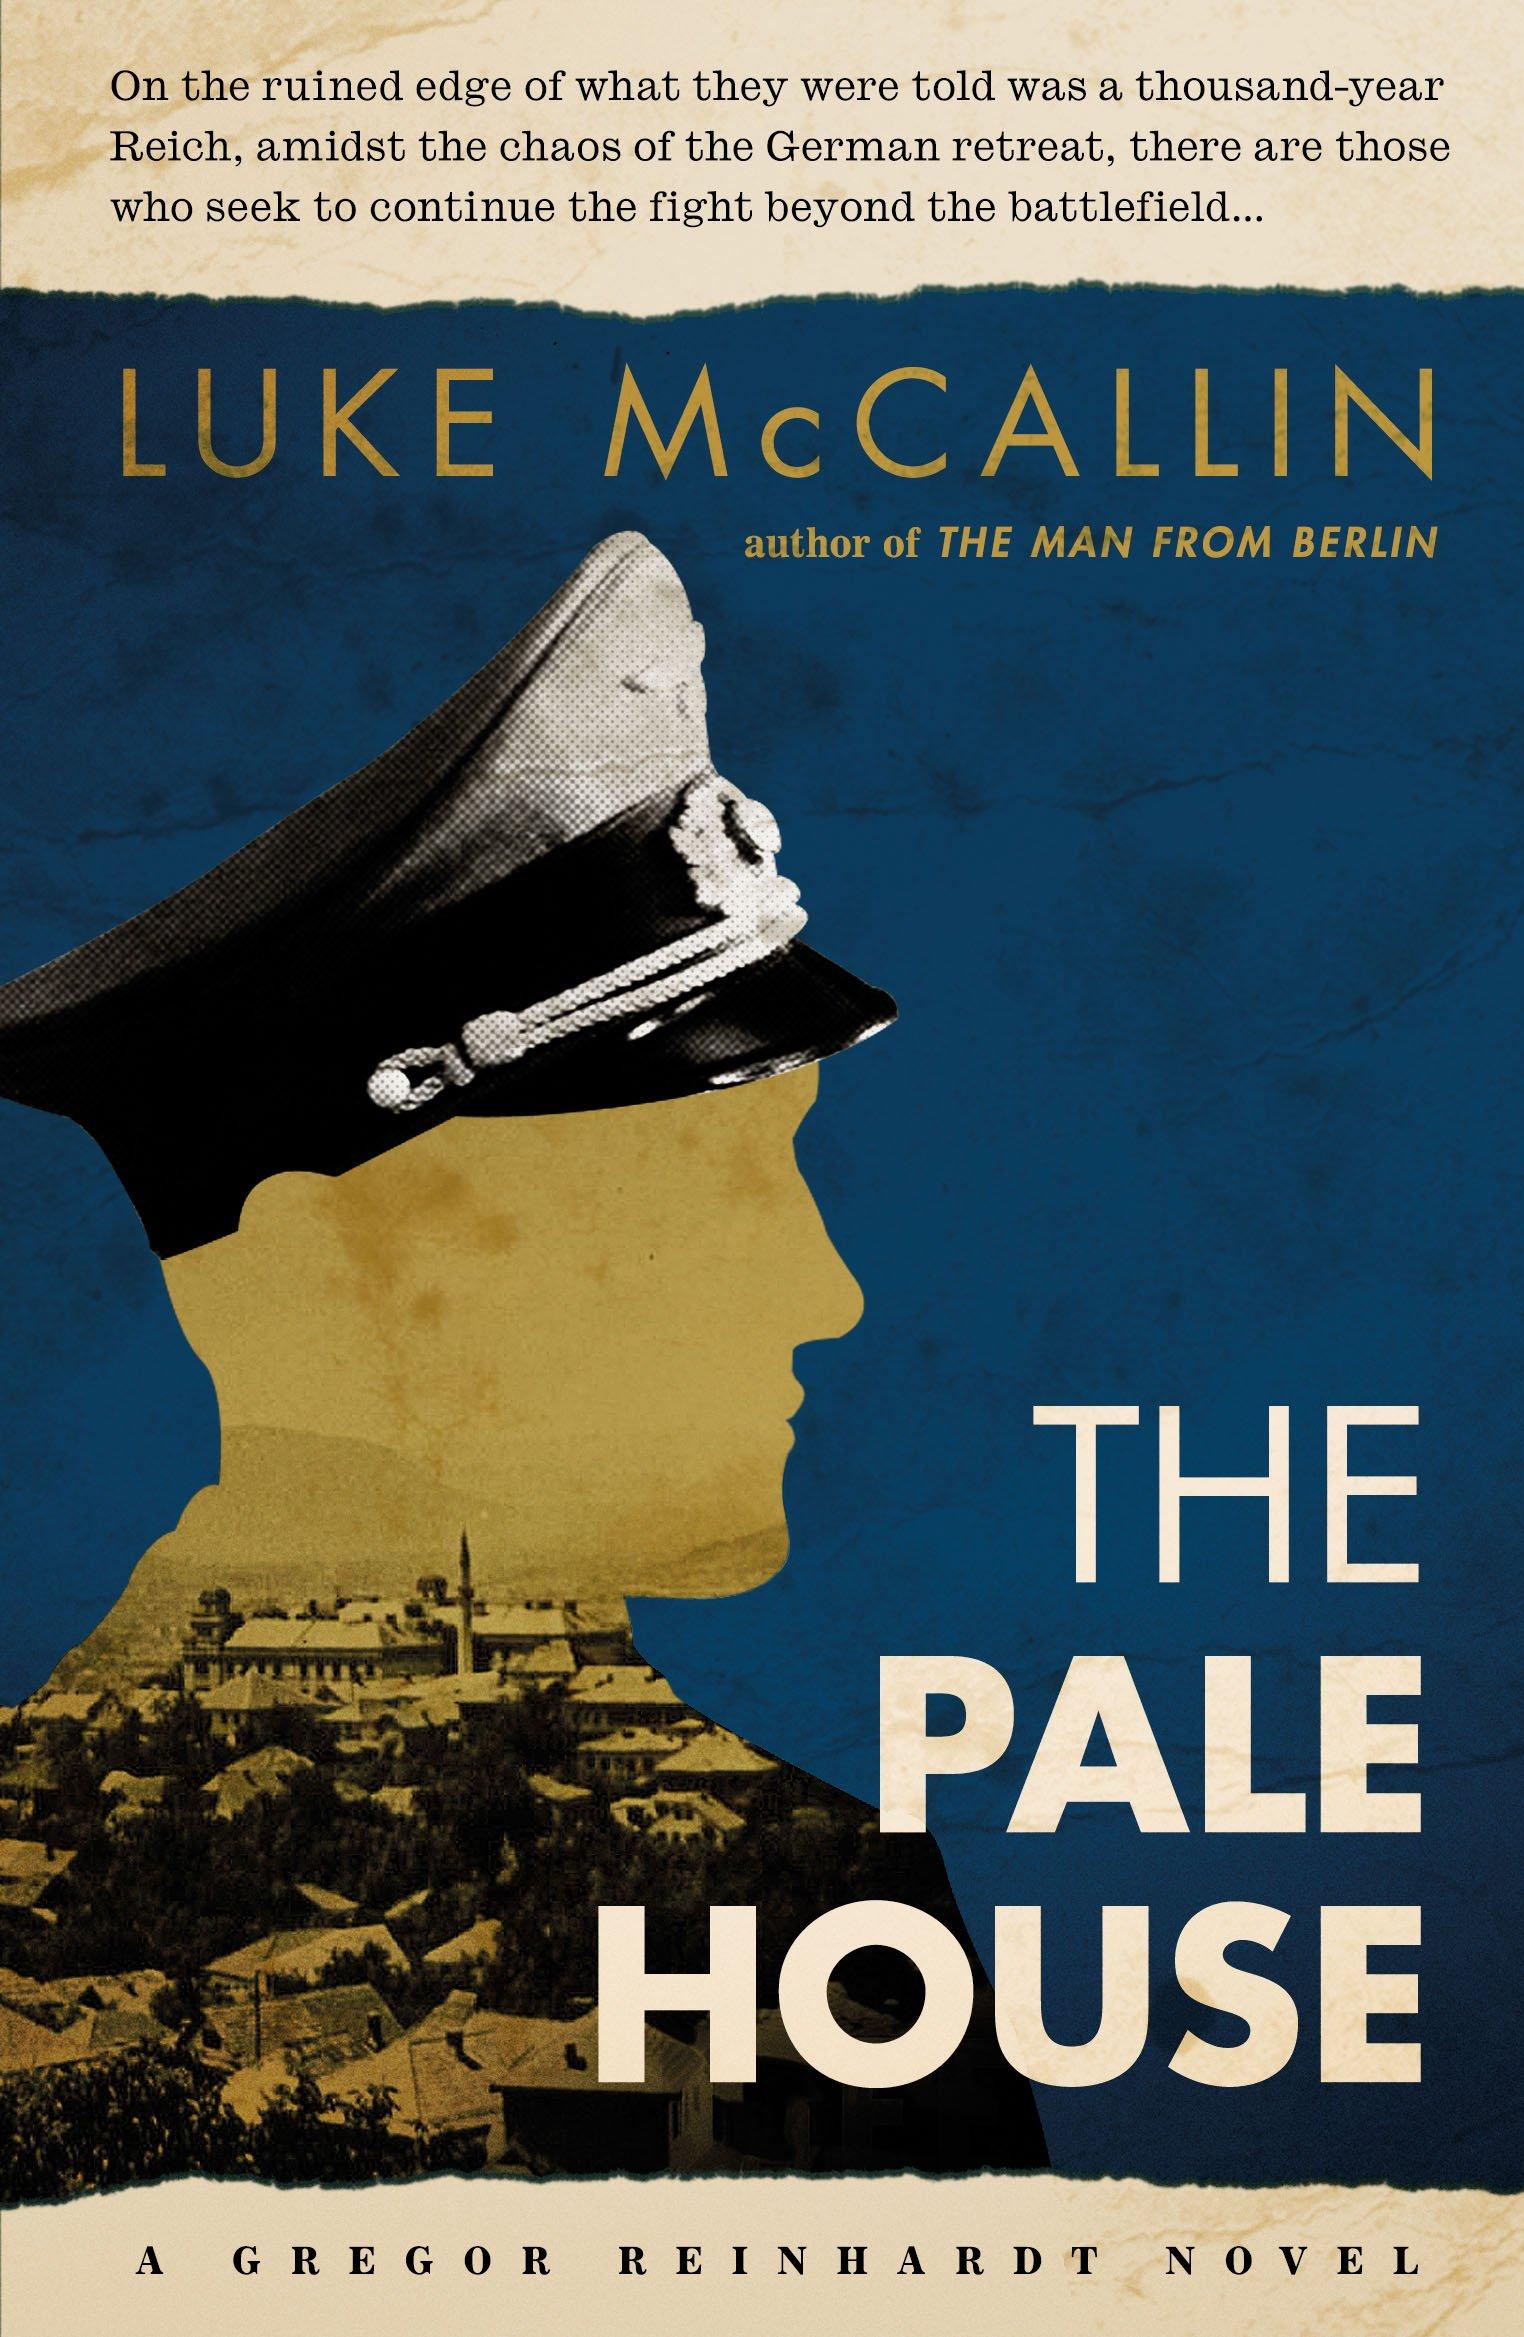 The Pale House: A Gregor Reinhardt Novel